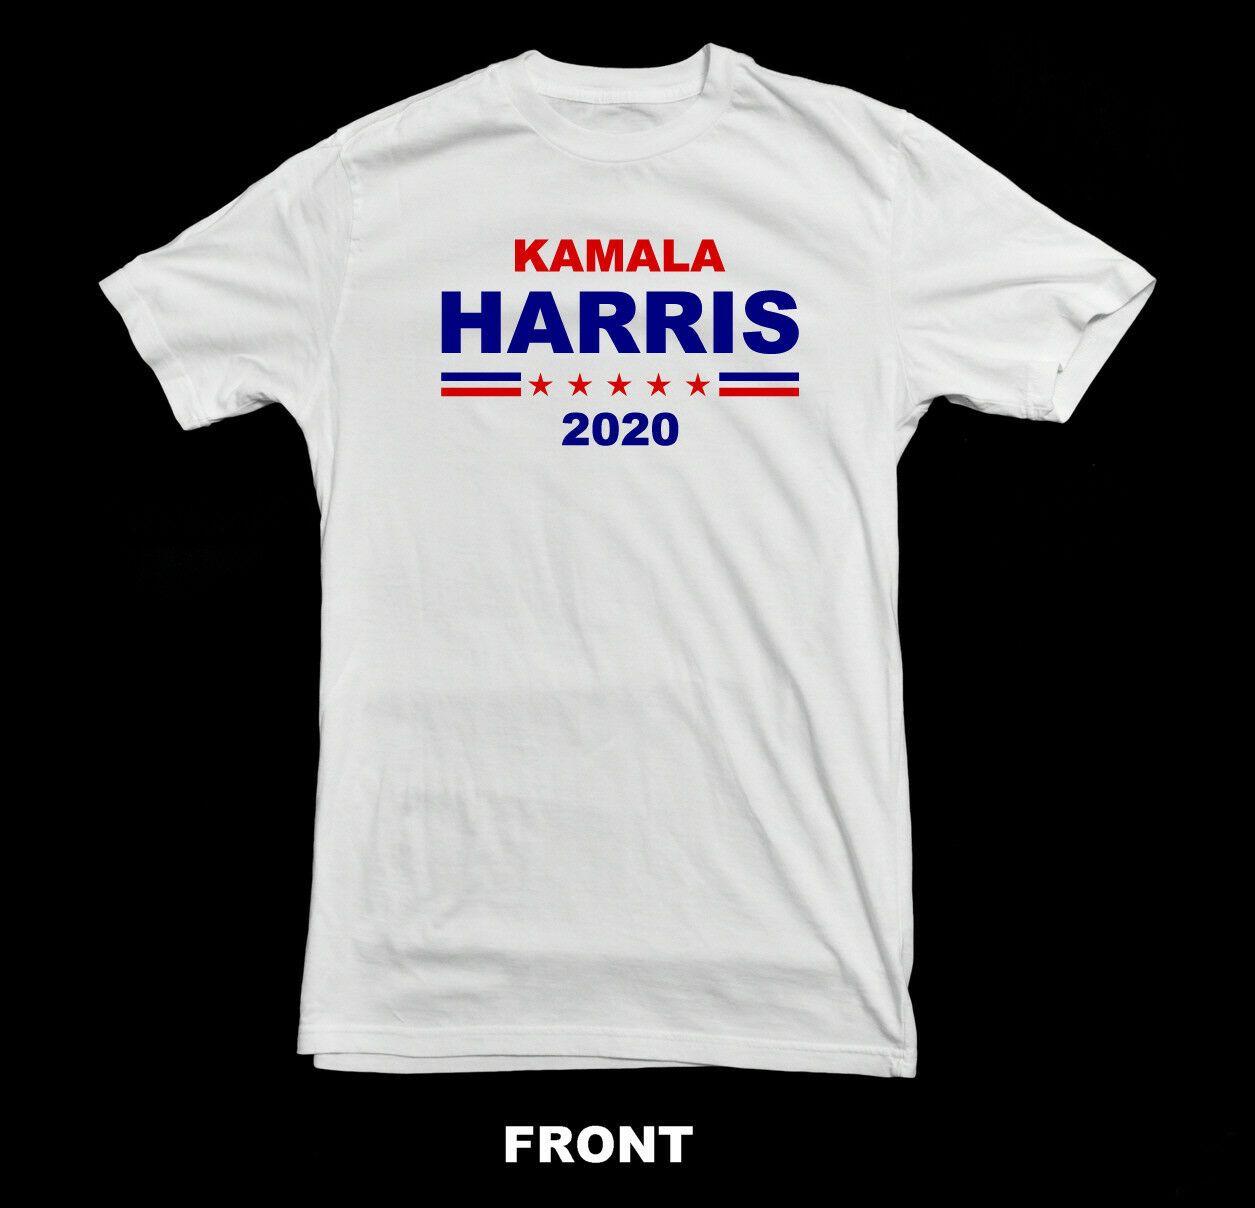 27cf1744dfe Kamala Harris For President 2020 T Shirt